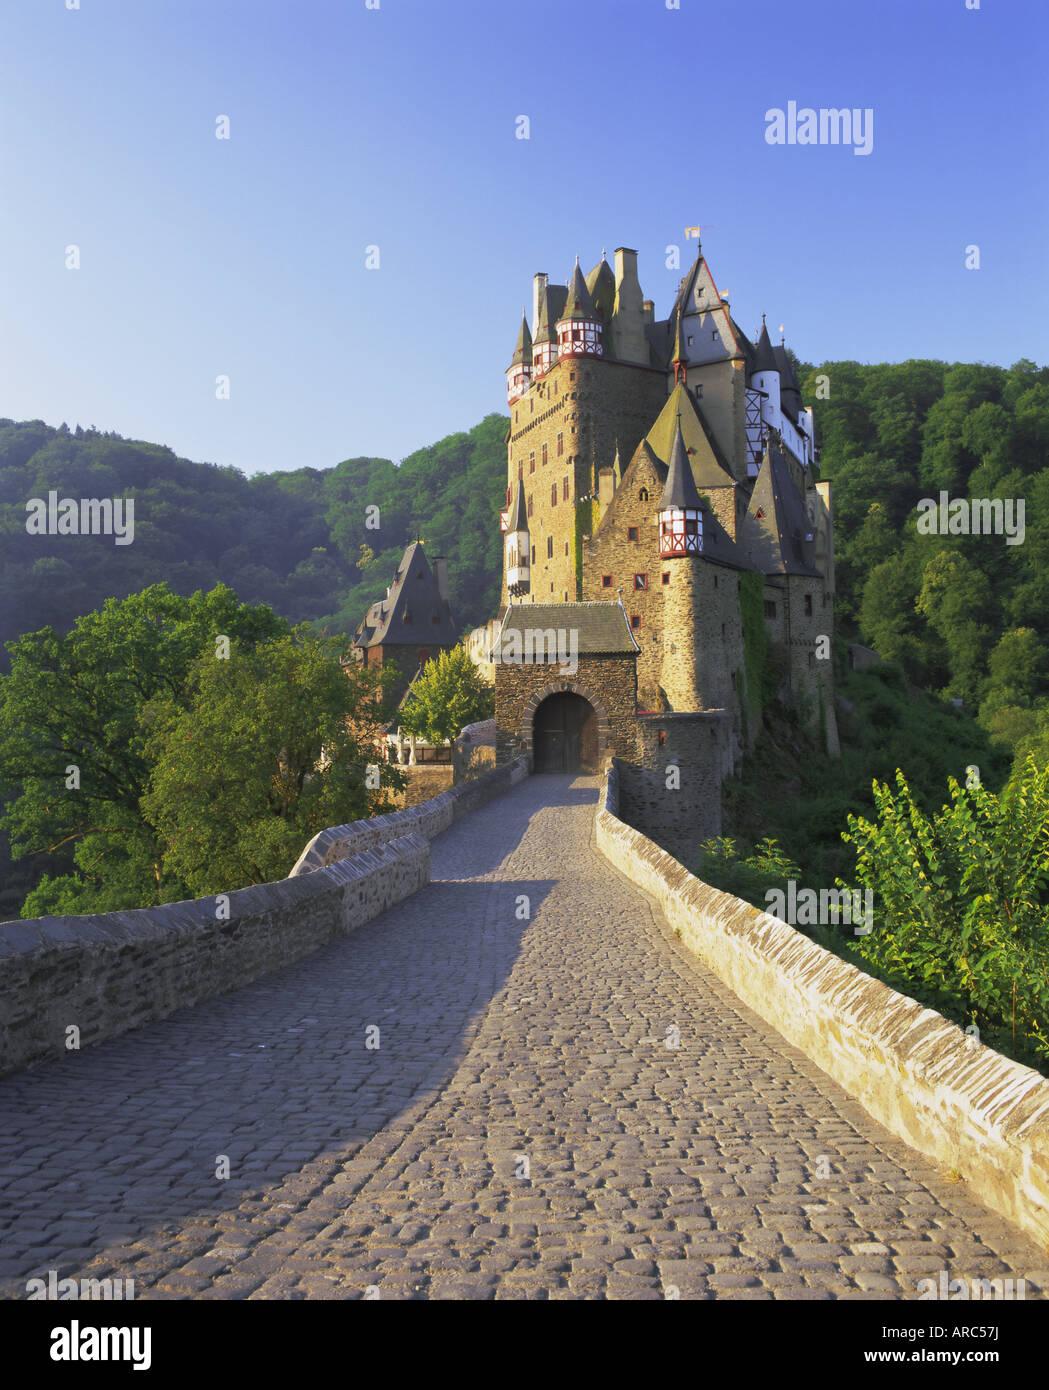 Burg Eltz, near Cochem, Rhineland (Rhineland-Palatinate) (Rheinland-Pfalz), Germany, Europe - Stock Image